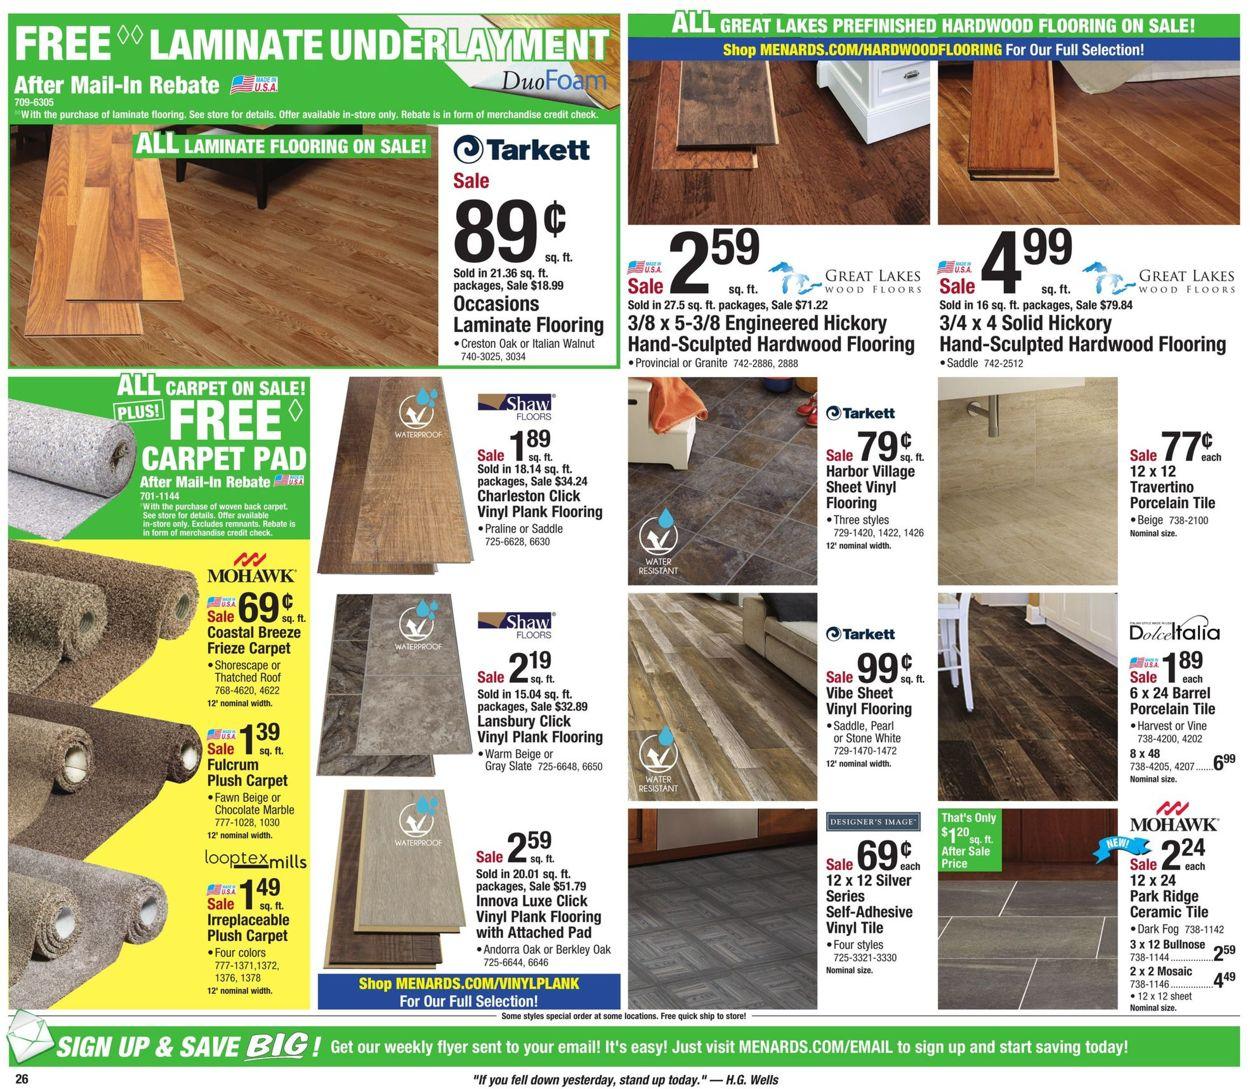 Menards Cur Weekly Ad 05 11, Menards Laminate Plank Flooring